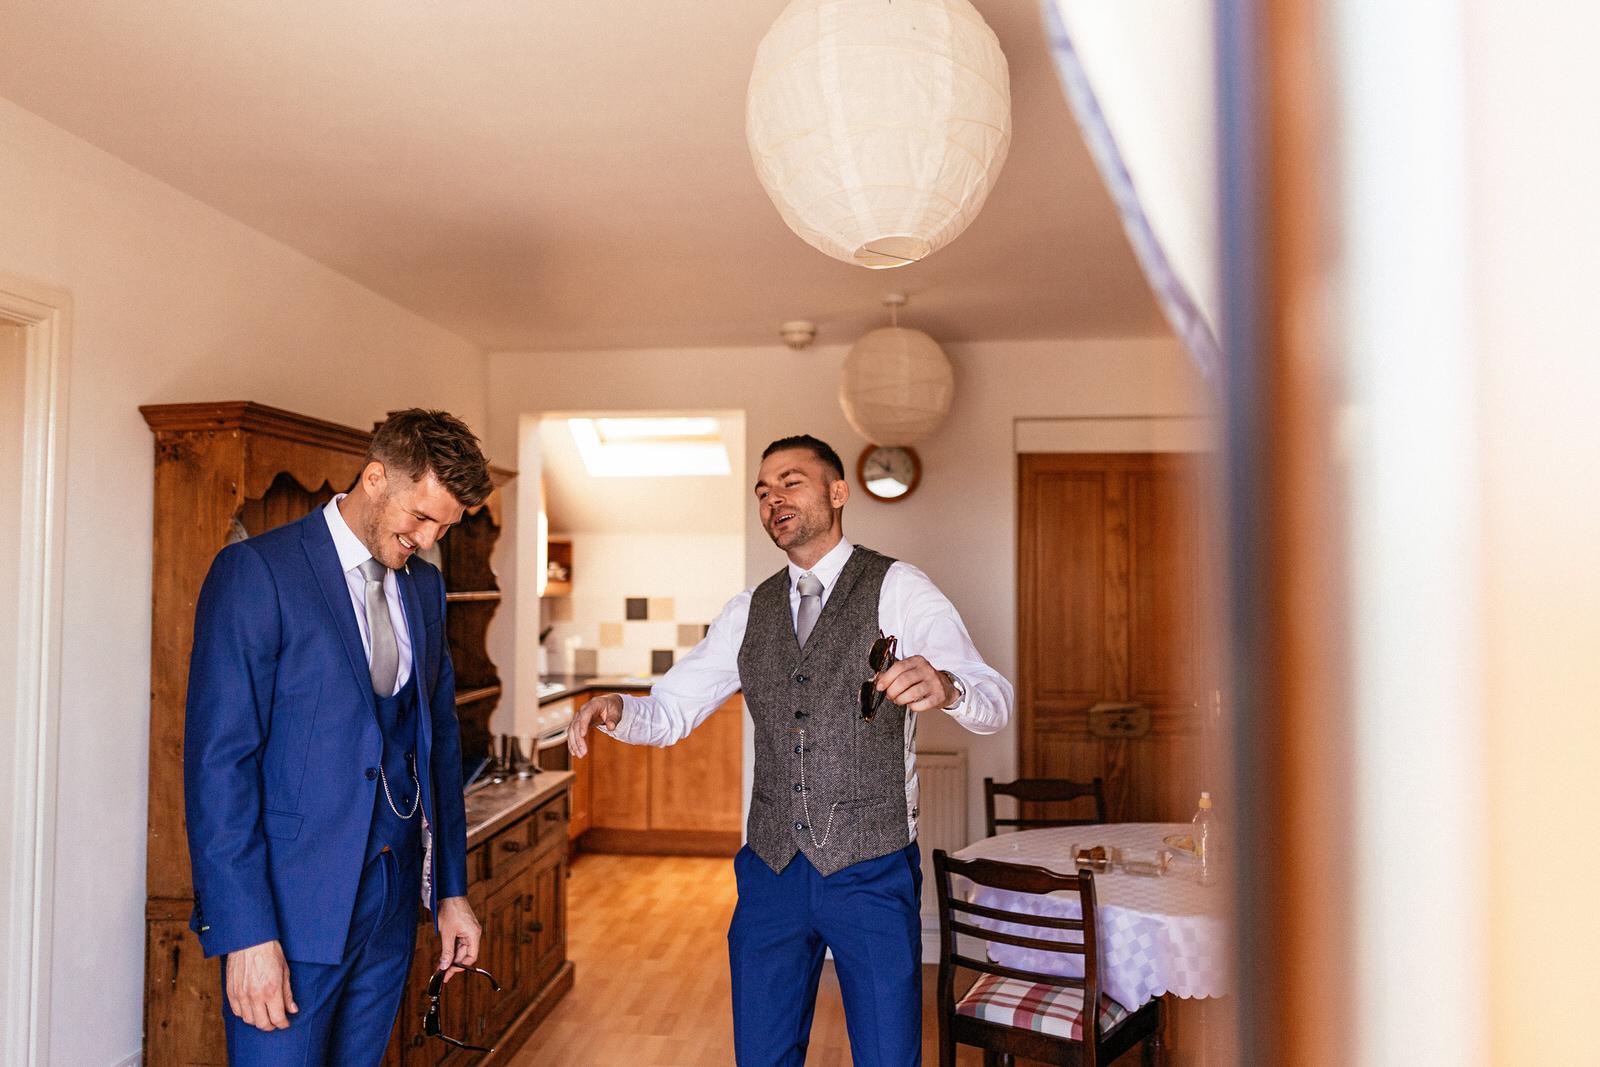 Moddershall-Oaks-Spa-Wedding-Photographer-003.jpg